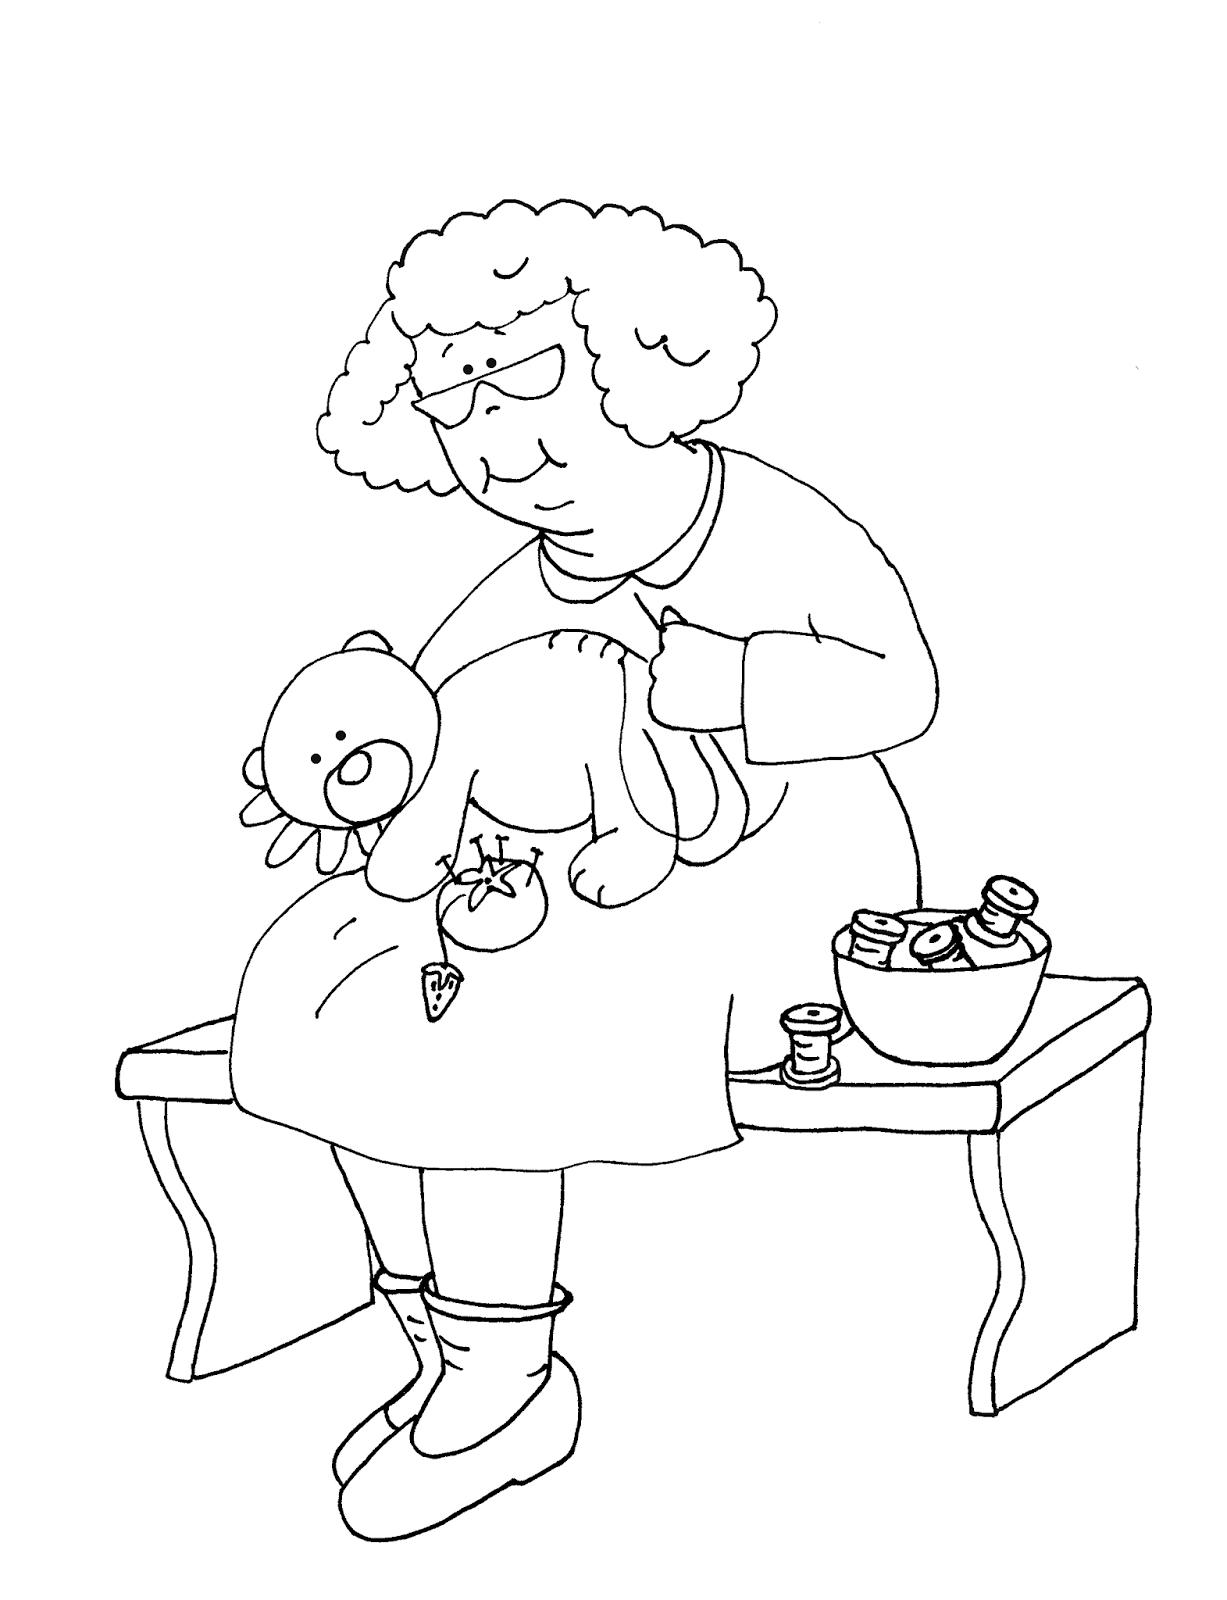 Картинки карандашом на день рождения бабушке